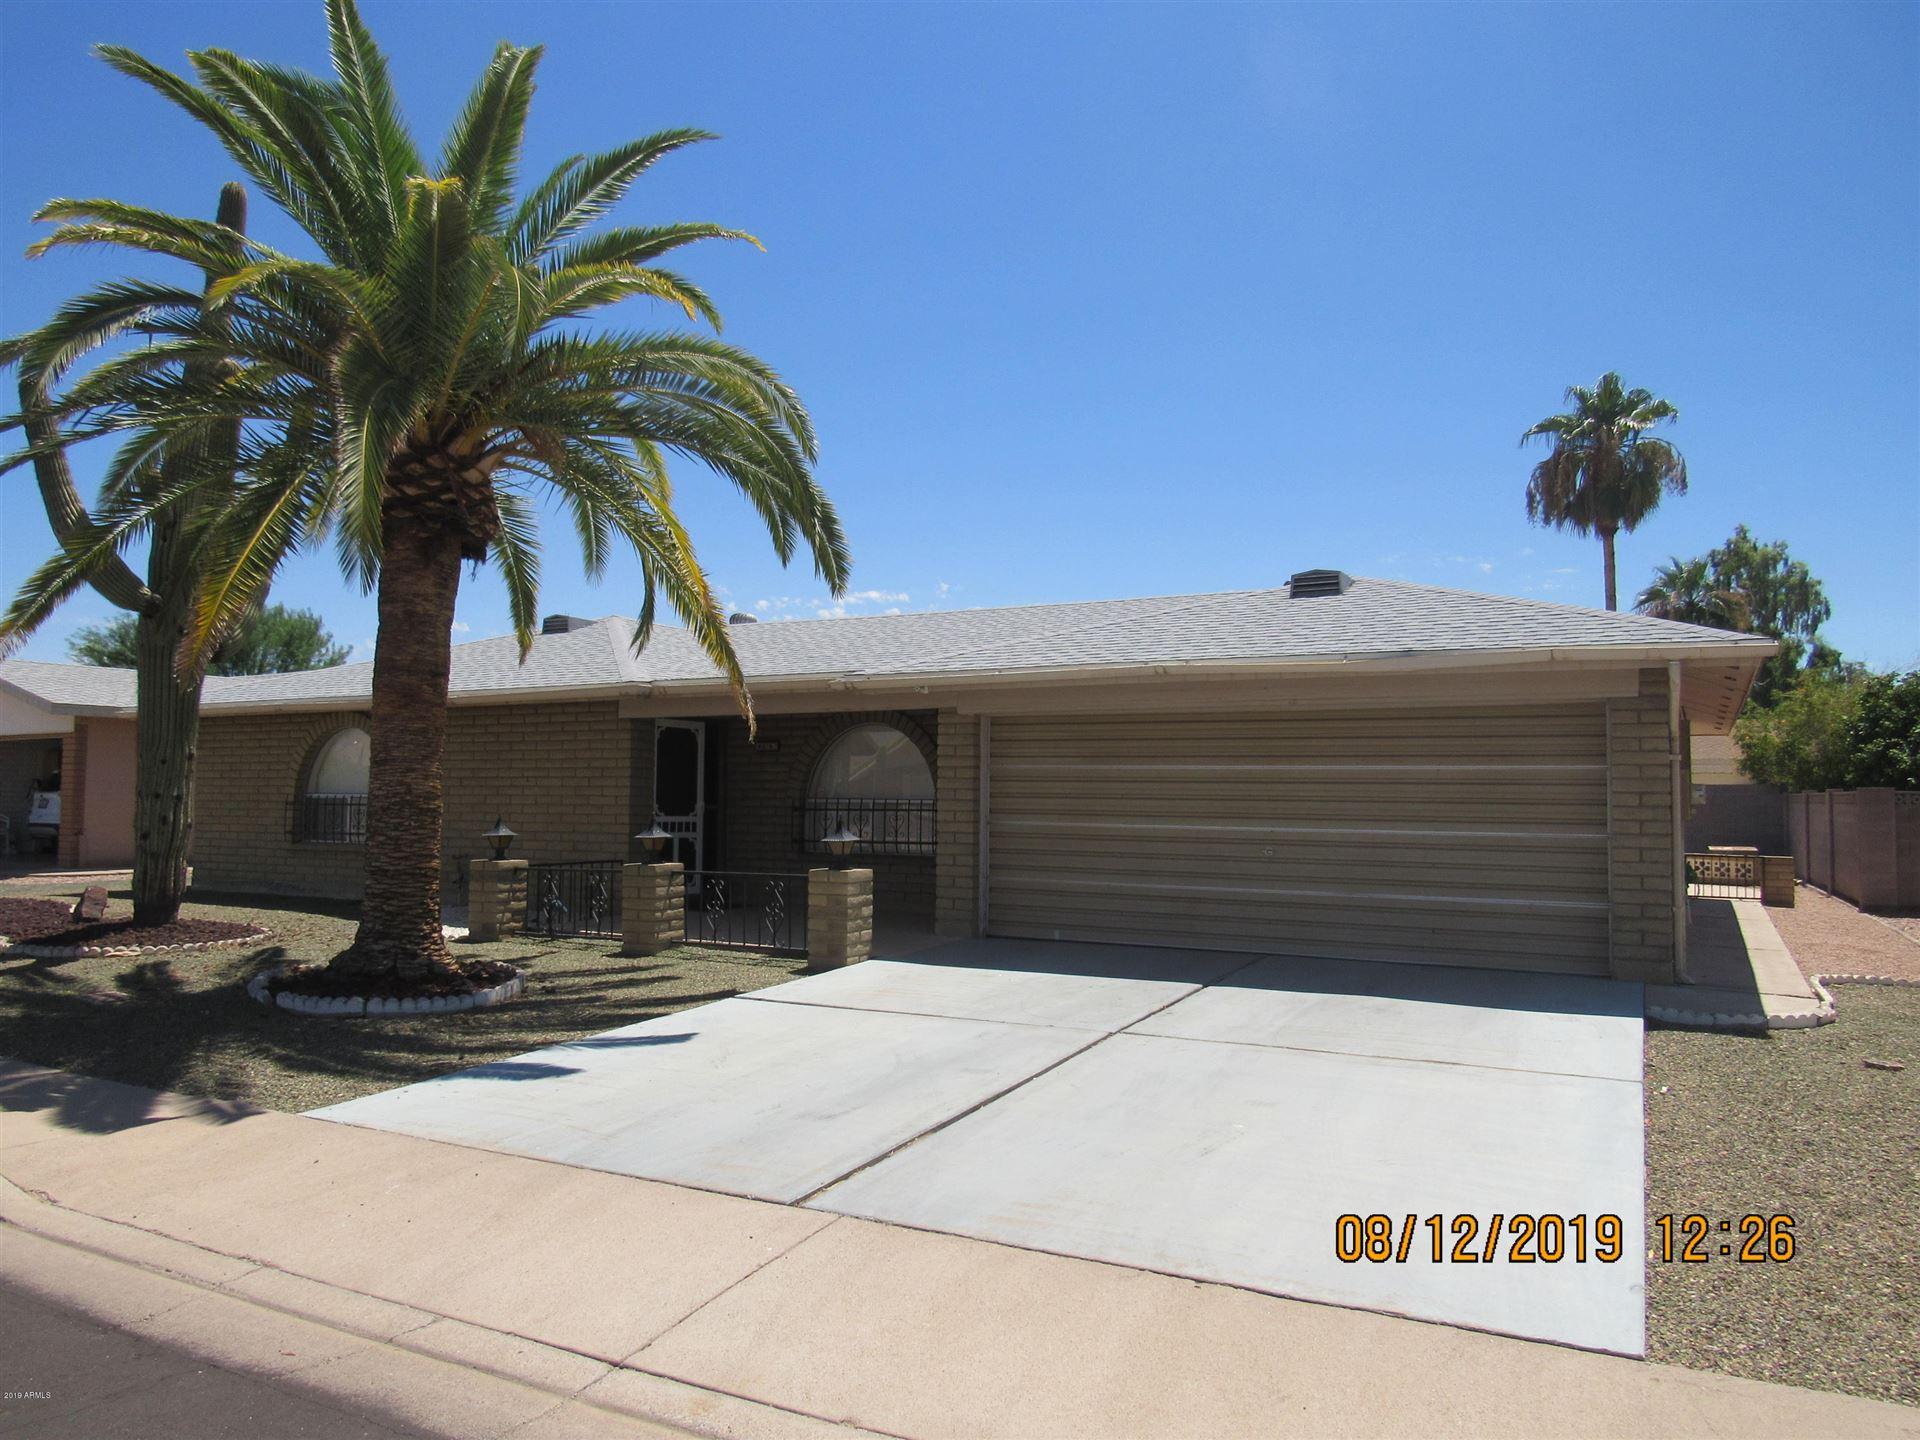 Photo of 4213 E DOLPHIN Avenue, Mesa, AZ 85206 (MLS # 6269154)